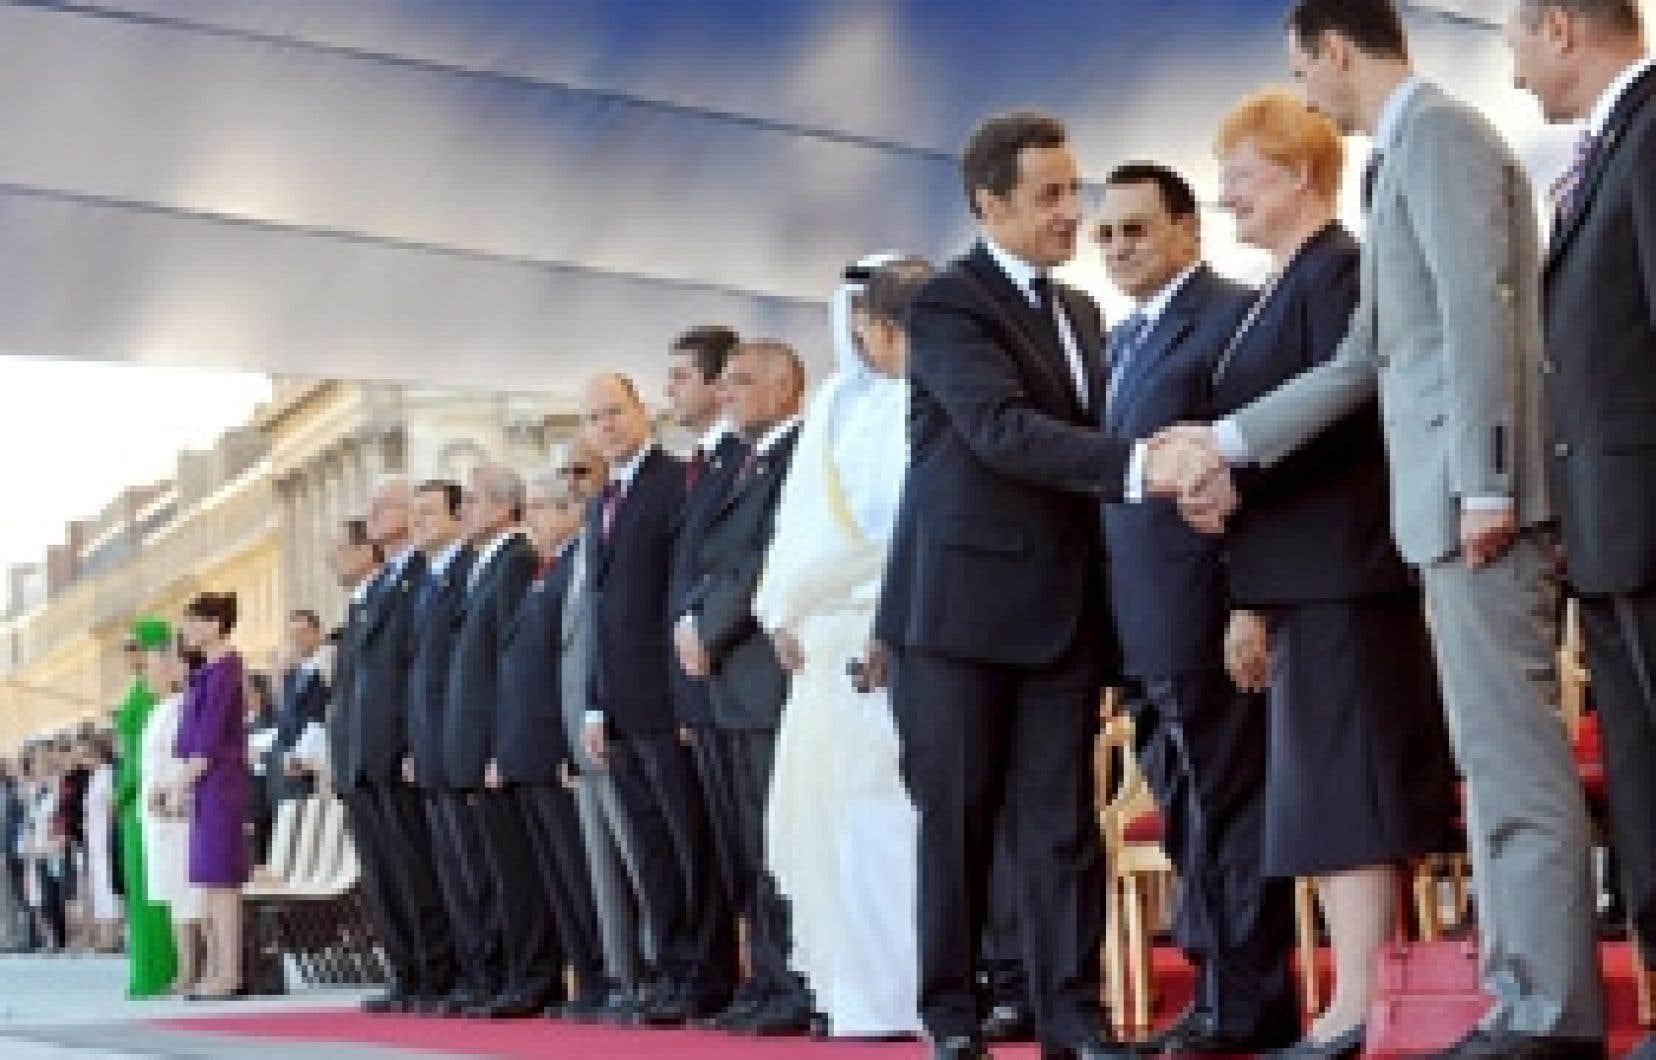 Le président français Nicolas Sarkozy serre la main de son homologue syrien, Bachar el-Assad.